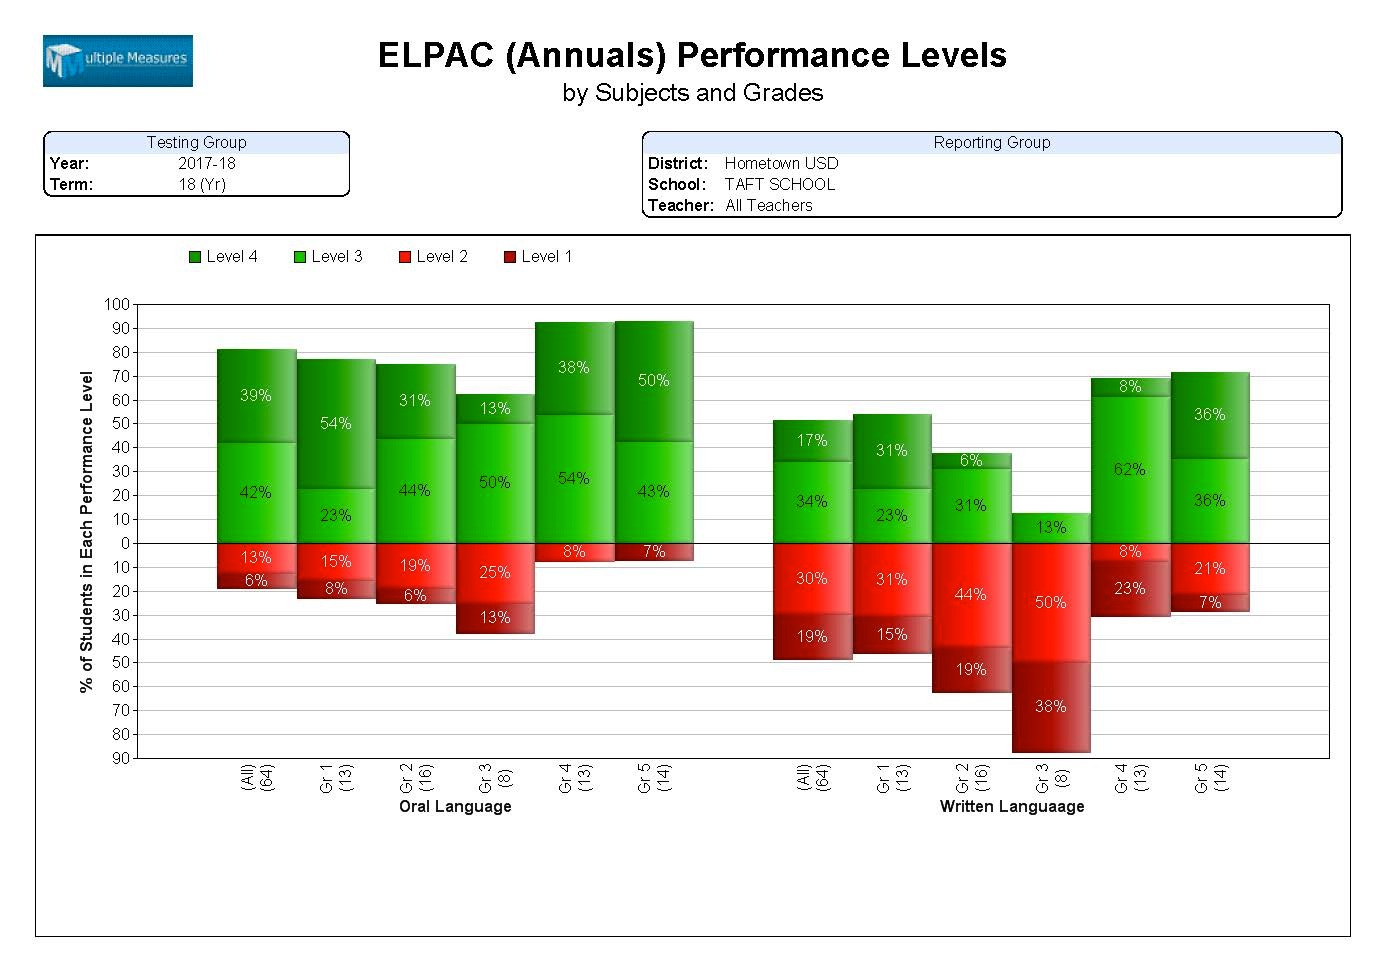 ELPAC-Summary_PerfLvls_Annual_CATALOG.jpg